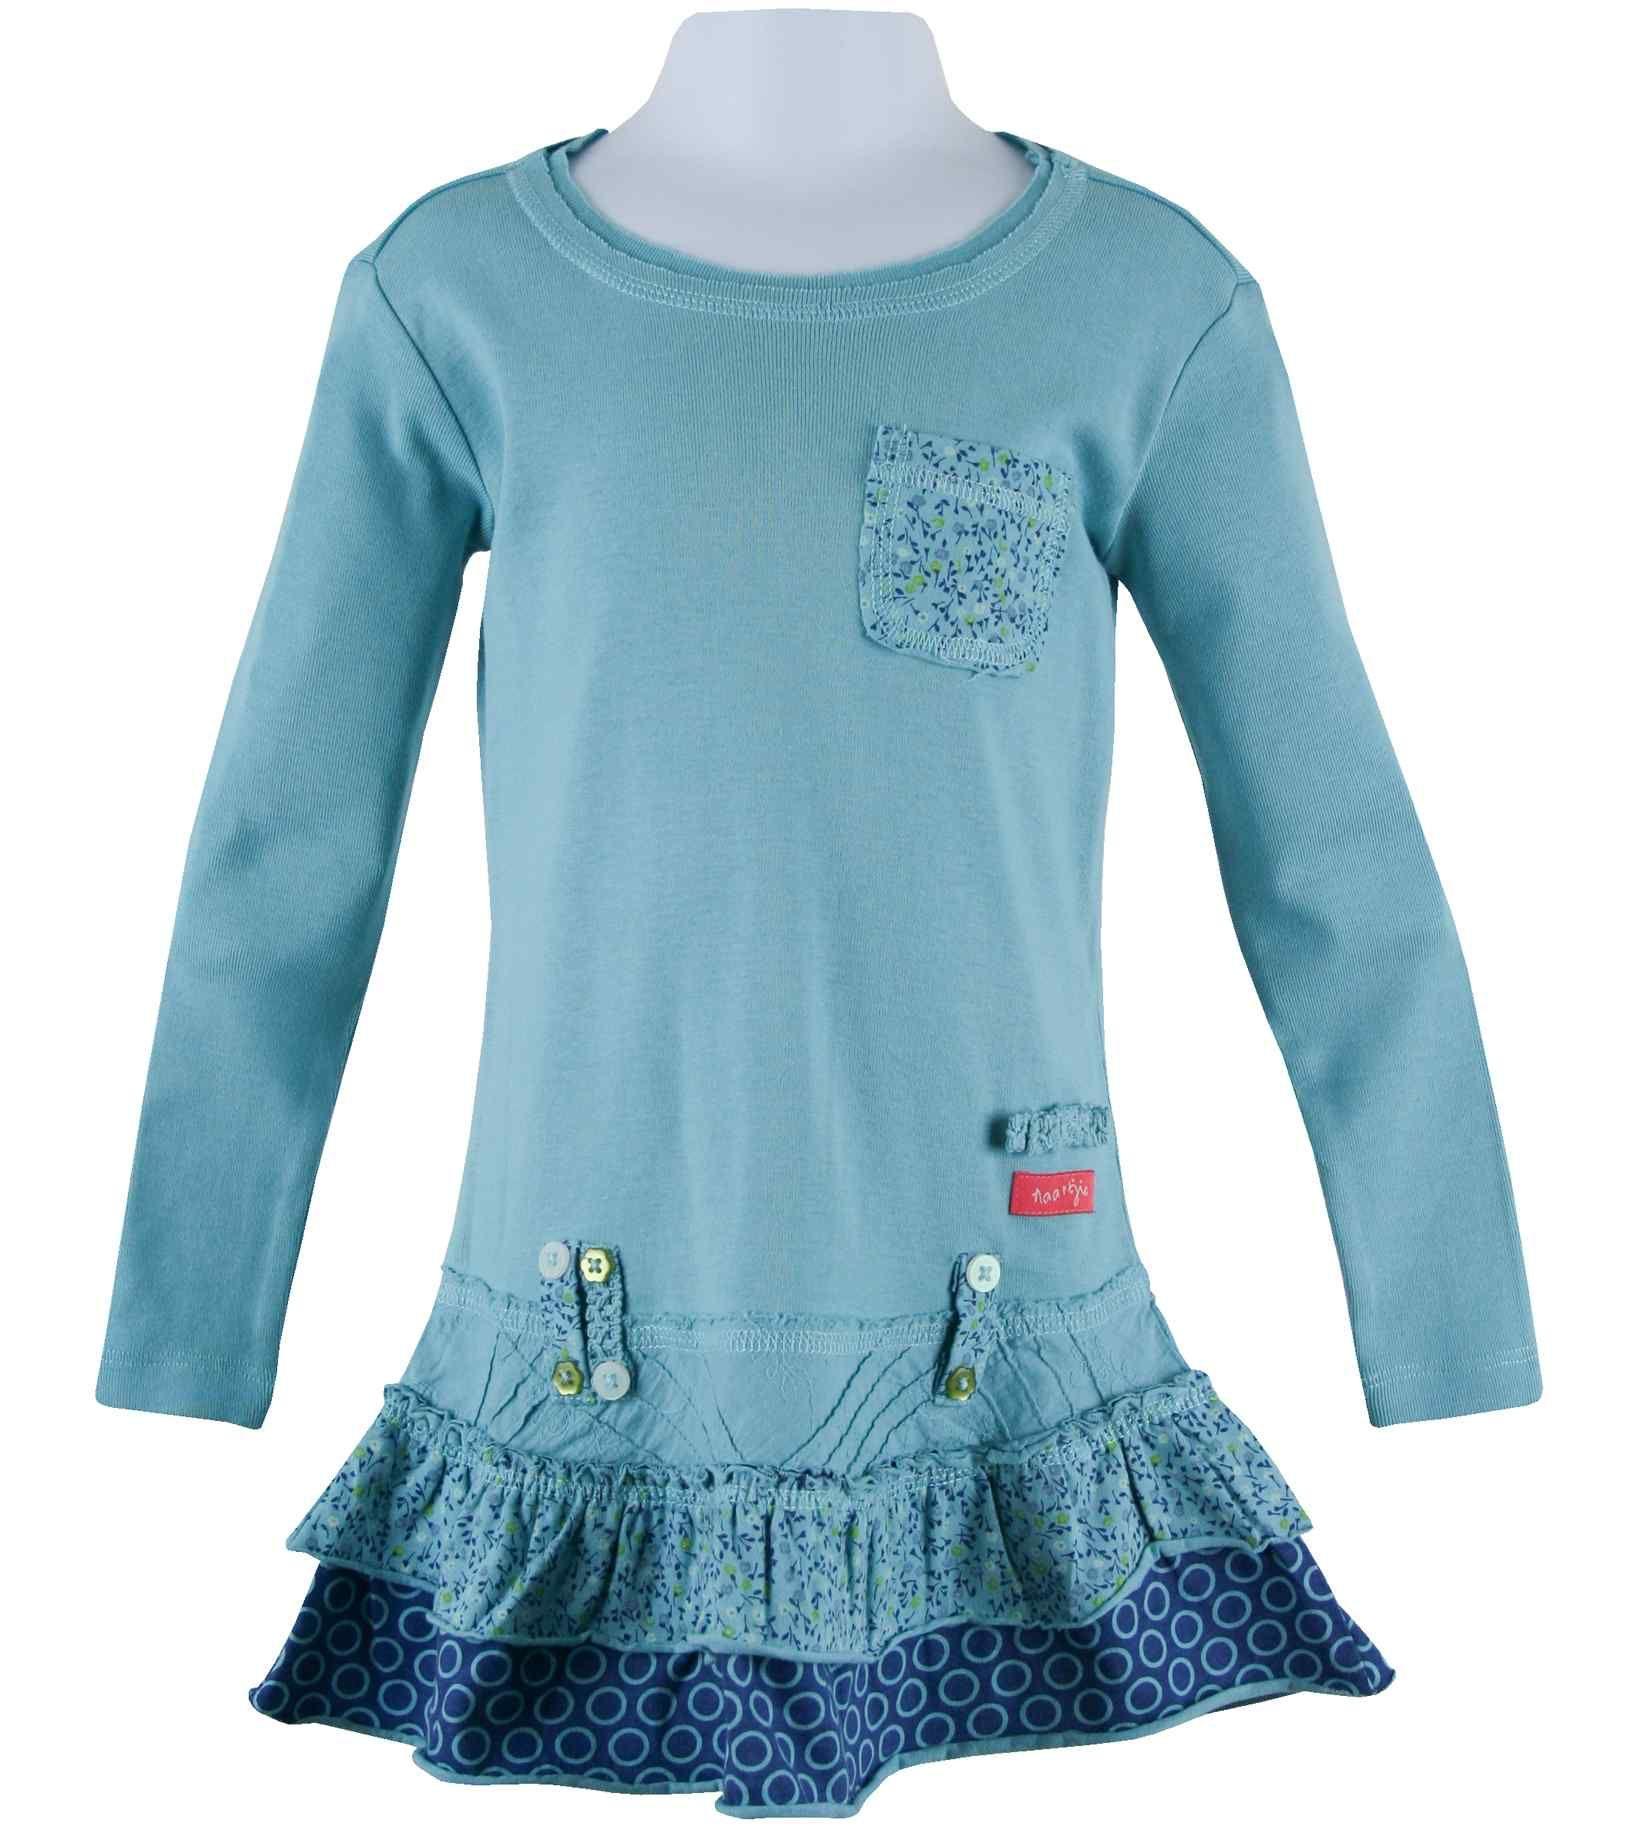 long sleeve mix print & pocket trimmed dress